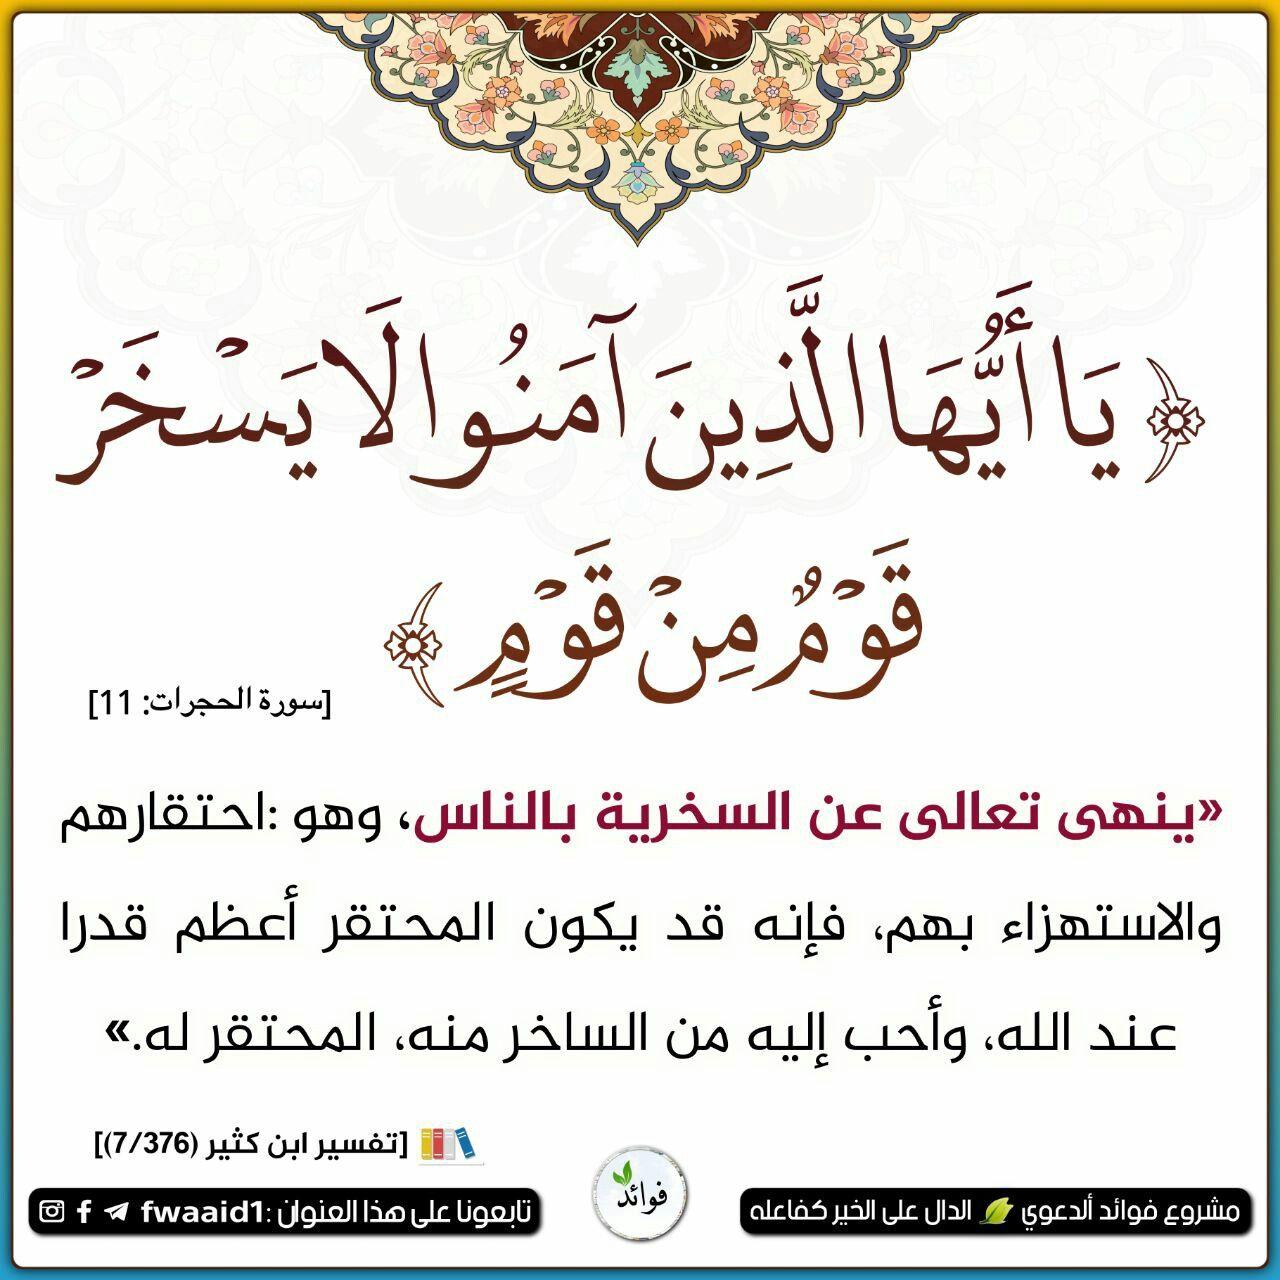 Pin By زهرة الياسمين On مقتطفات إسلامية Arabic Calligraphy Calligraphy